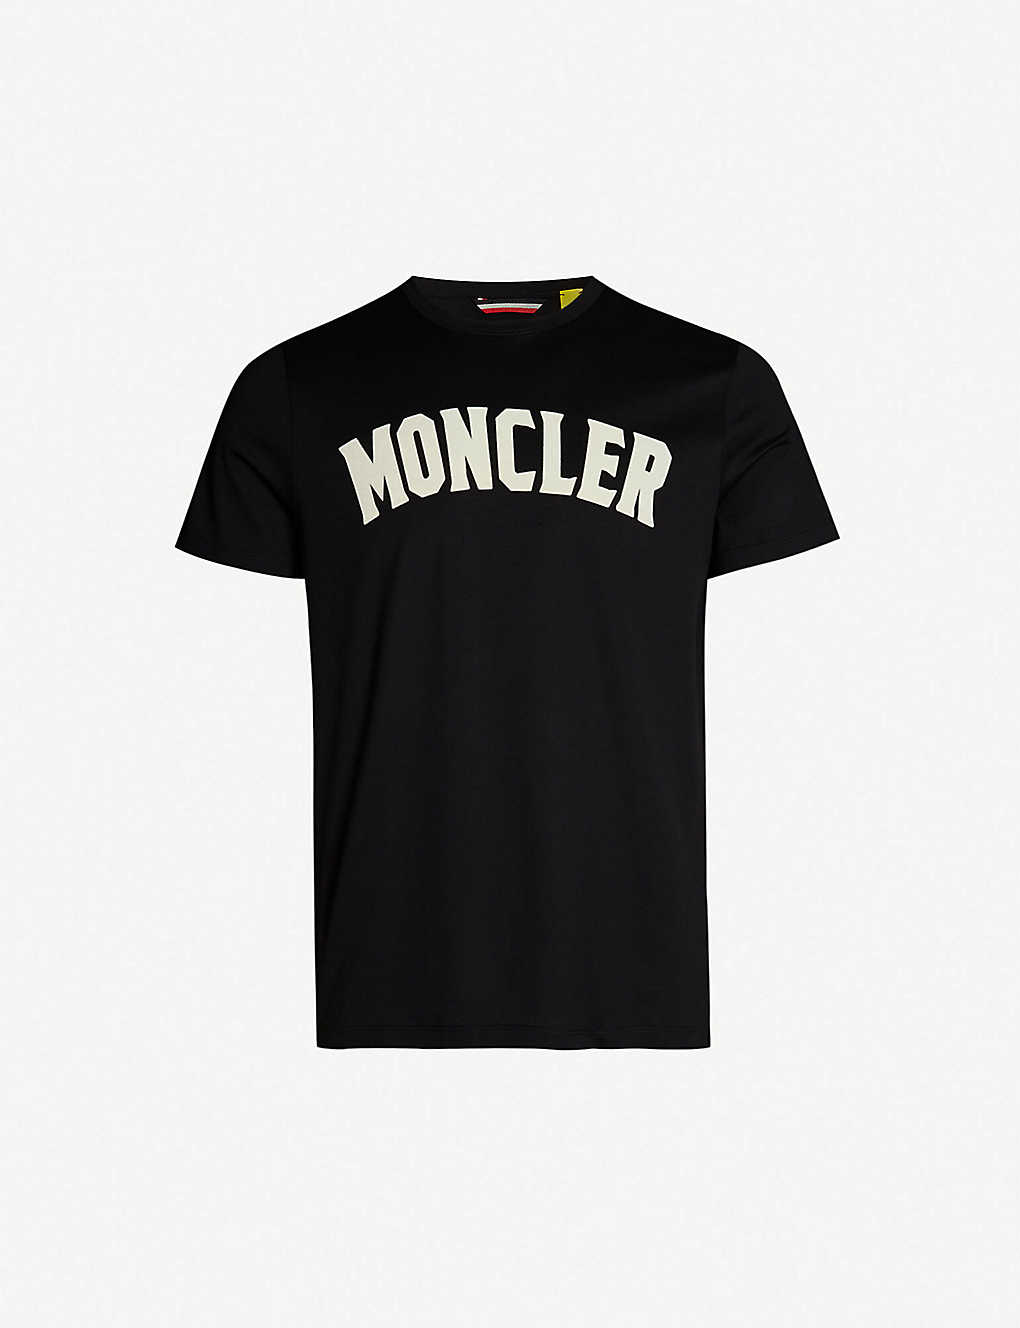 57cb328ebf718 MONCLER GENIUS - Moncler 2 1952 logo-print cotton-jersey T-shirt ...